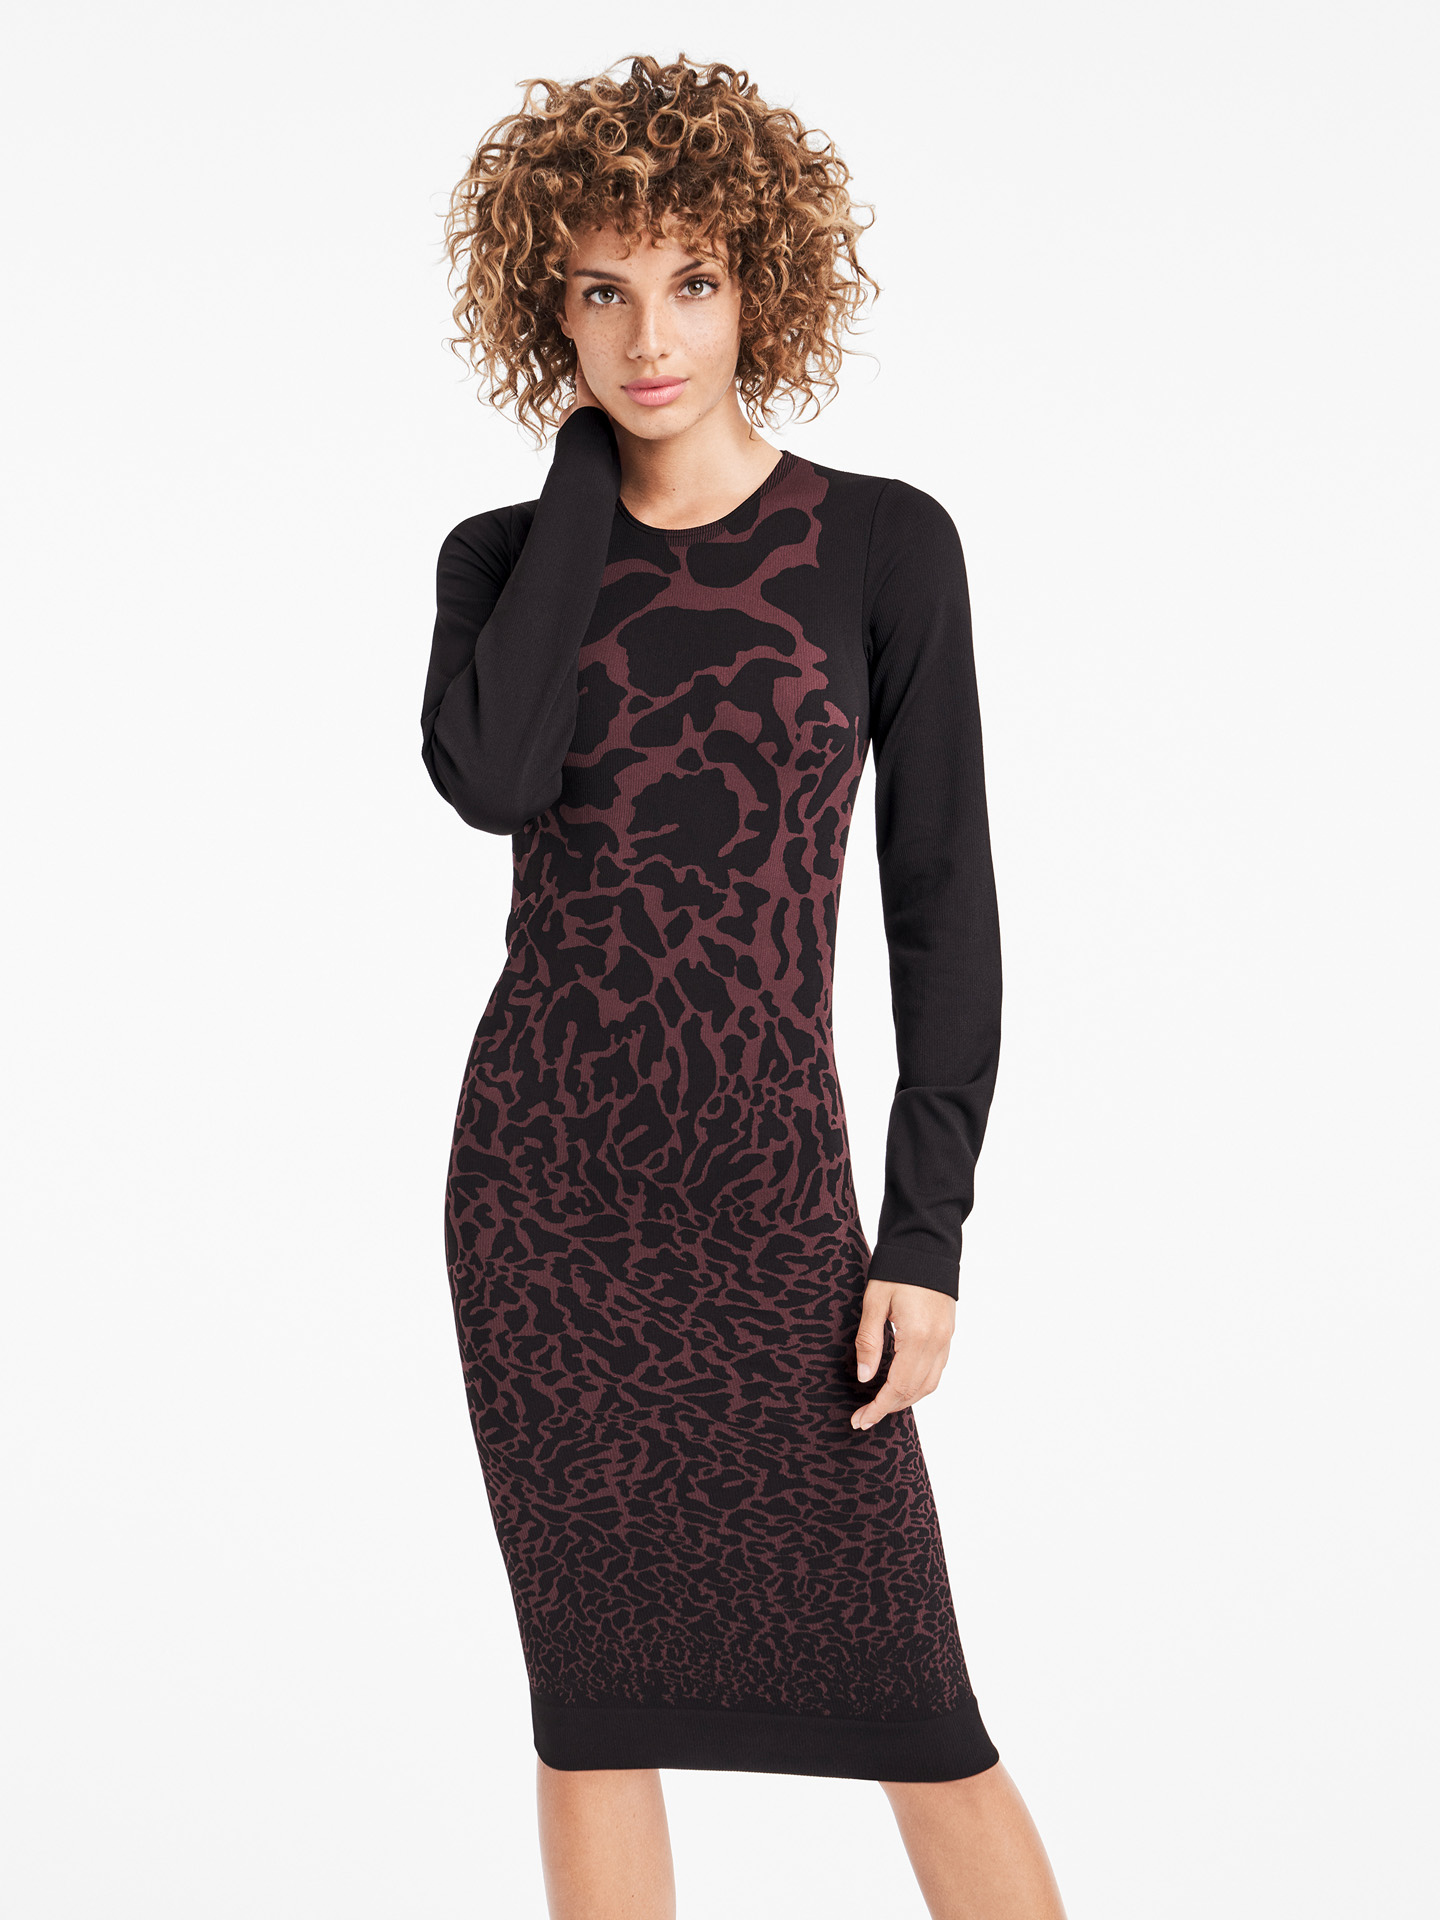 Wolford Apparel & Accessories > Clothing > Abbigliamento Donna Leo Dress